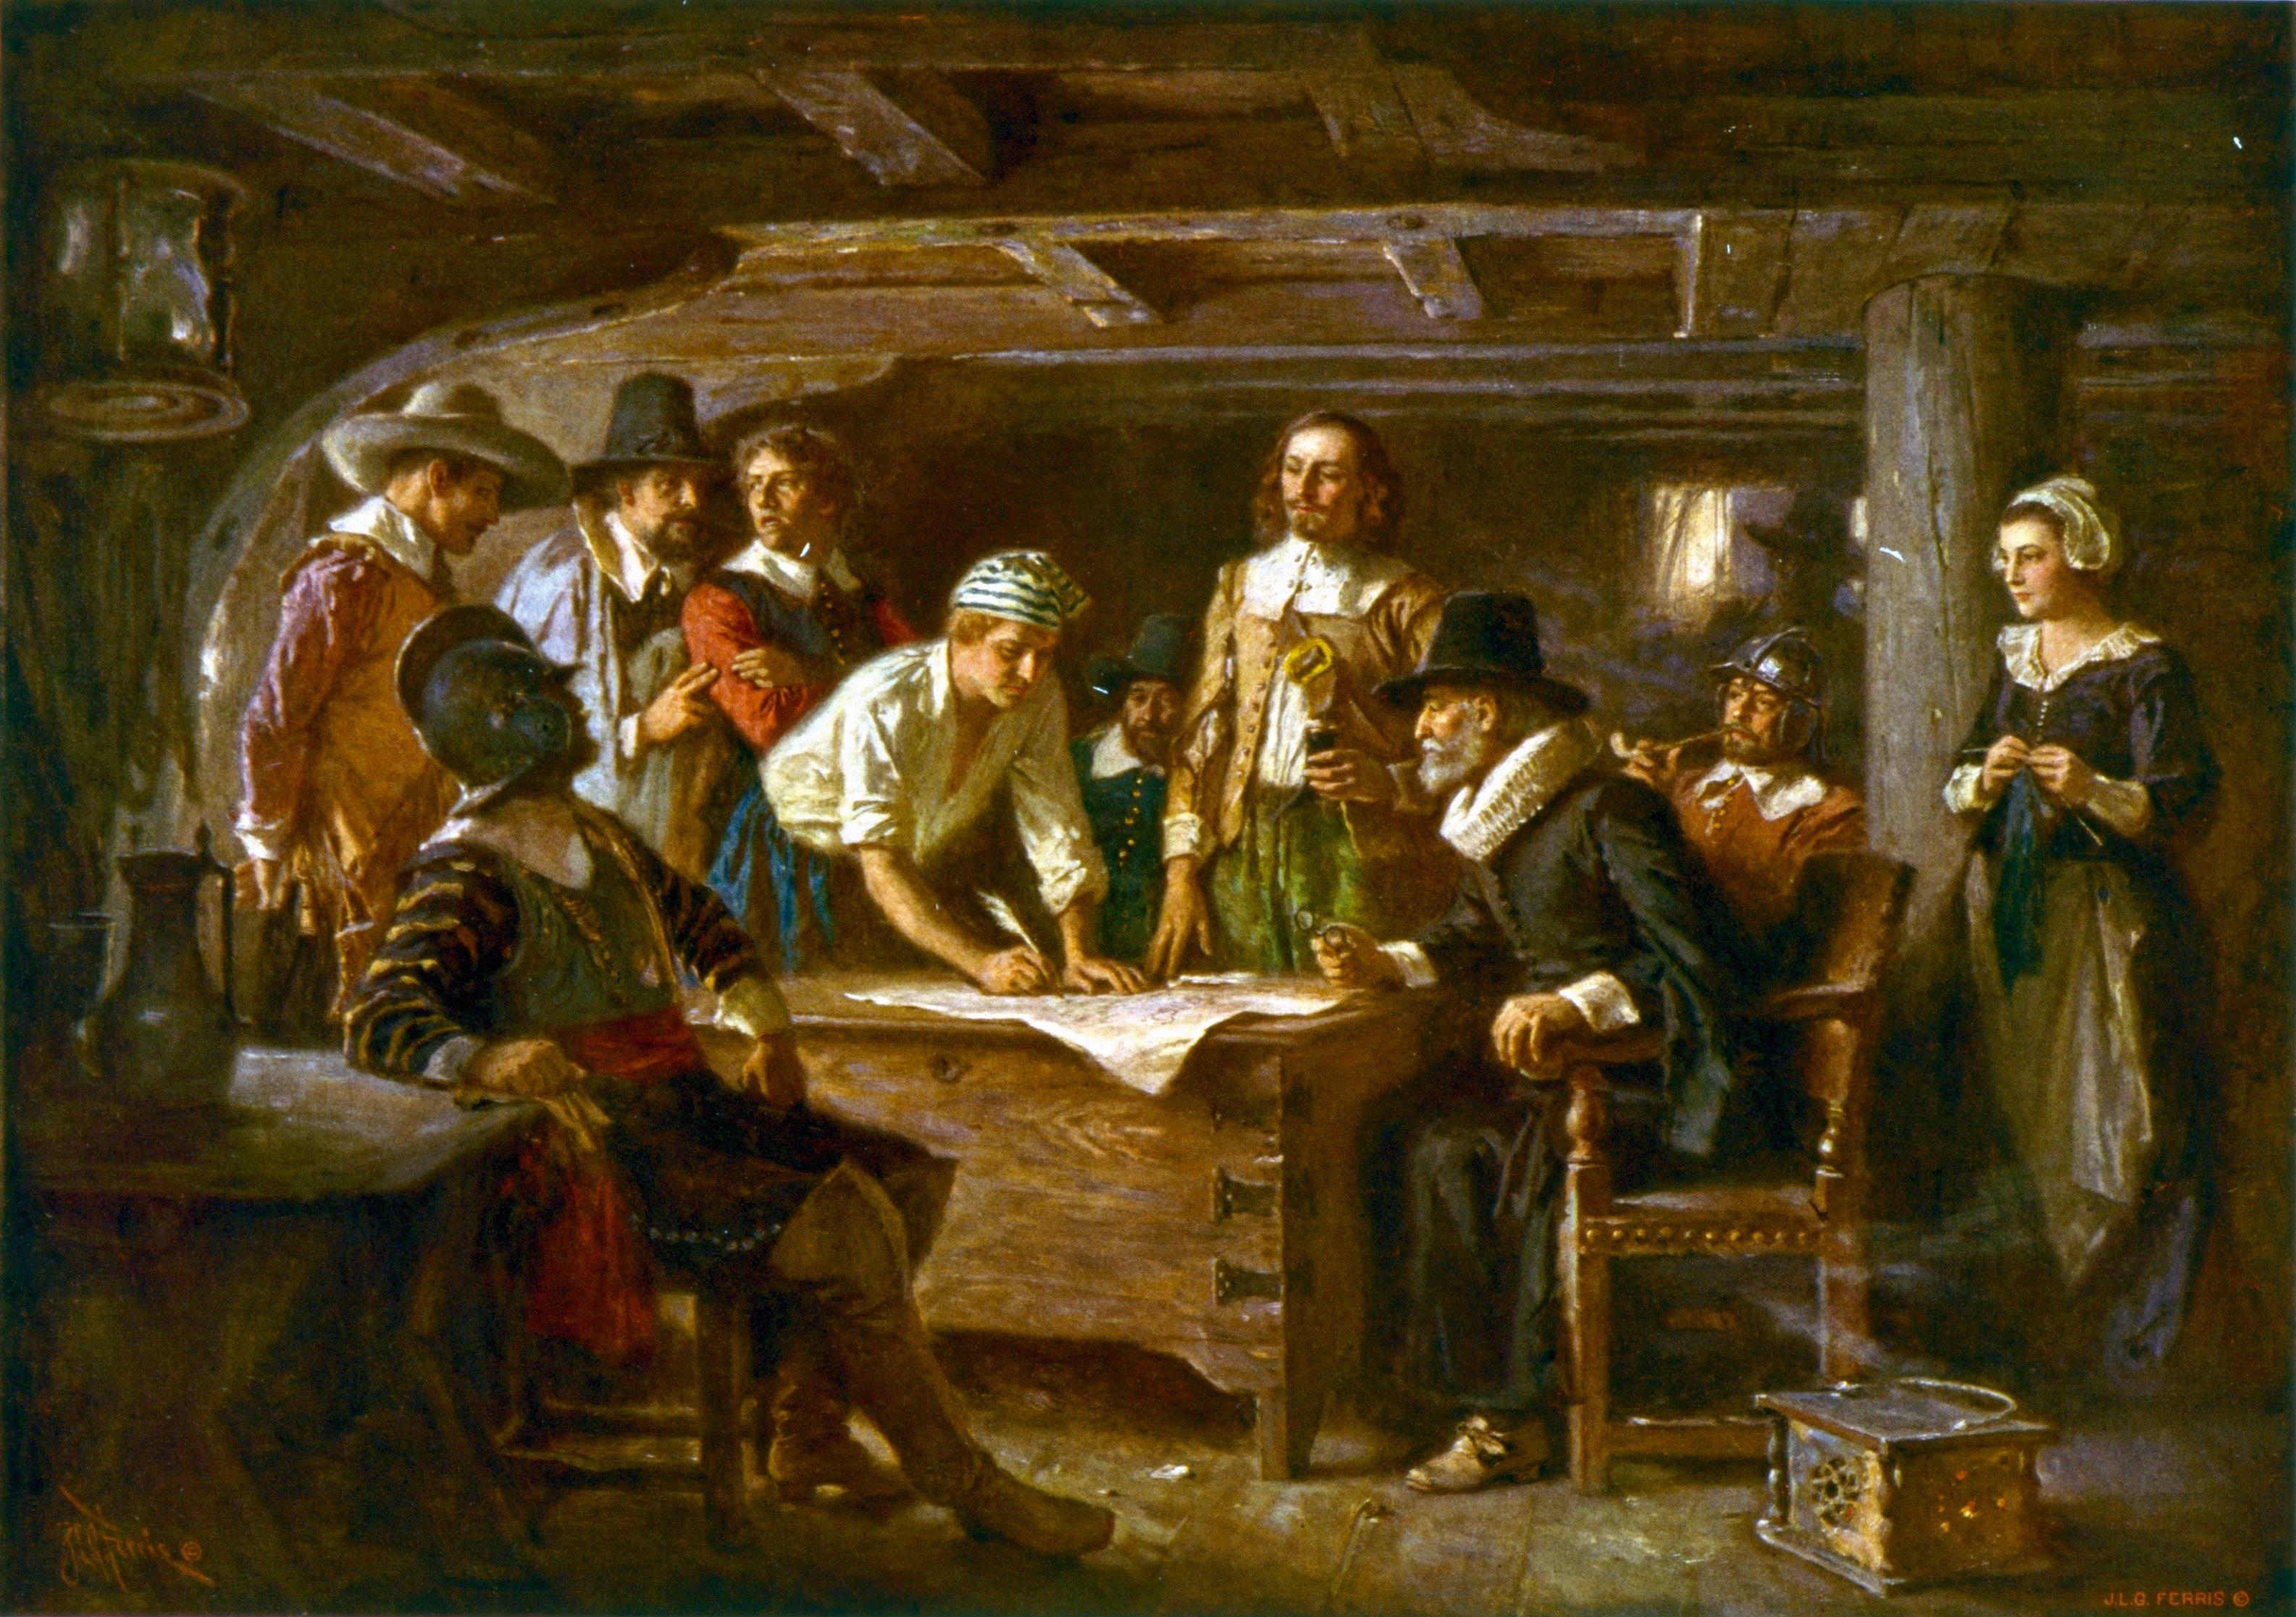 The_Mayflower_Compact_1620_cph.3g07155.jpg